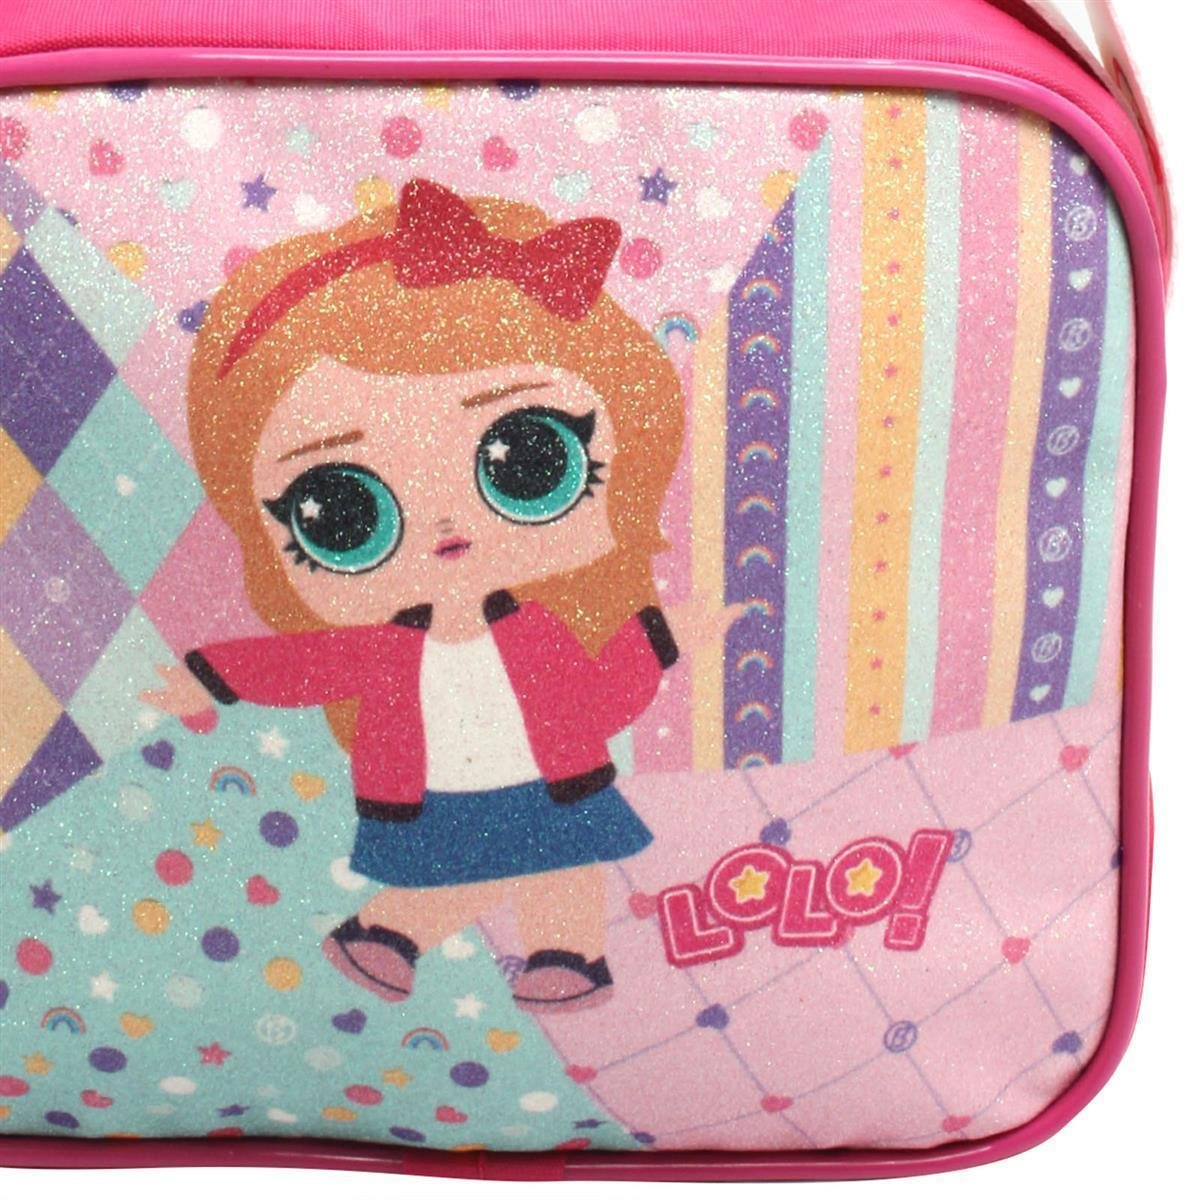 Bolsa Glitter Lorena Queiroz Feminina Infantil - Pink